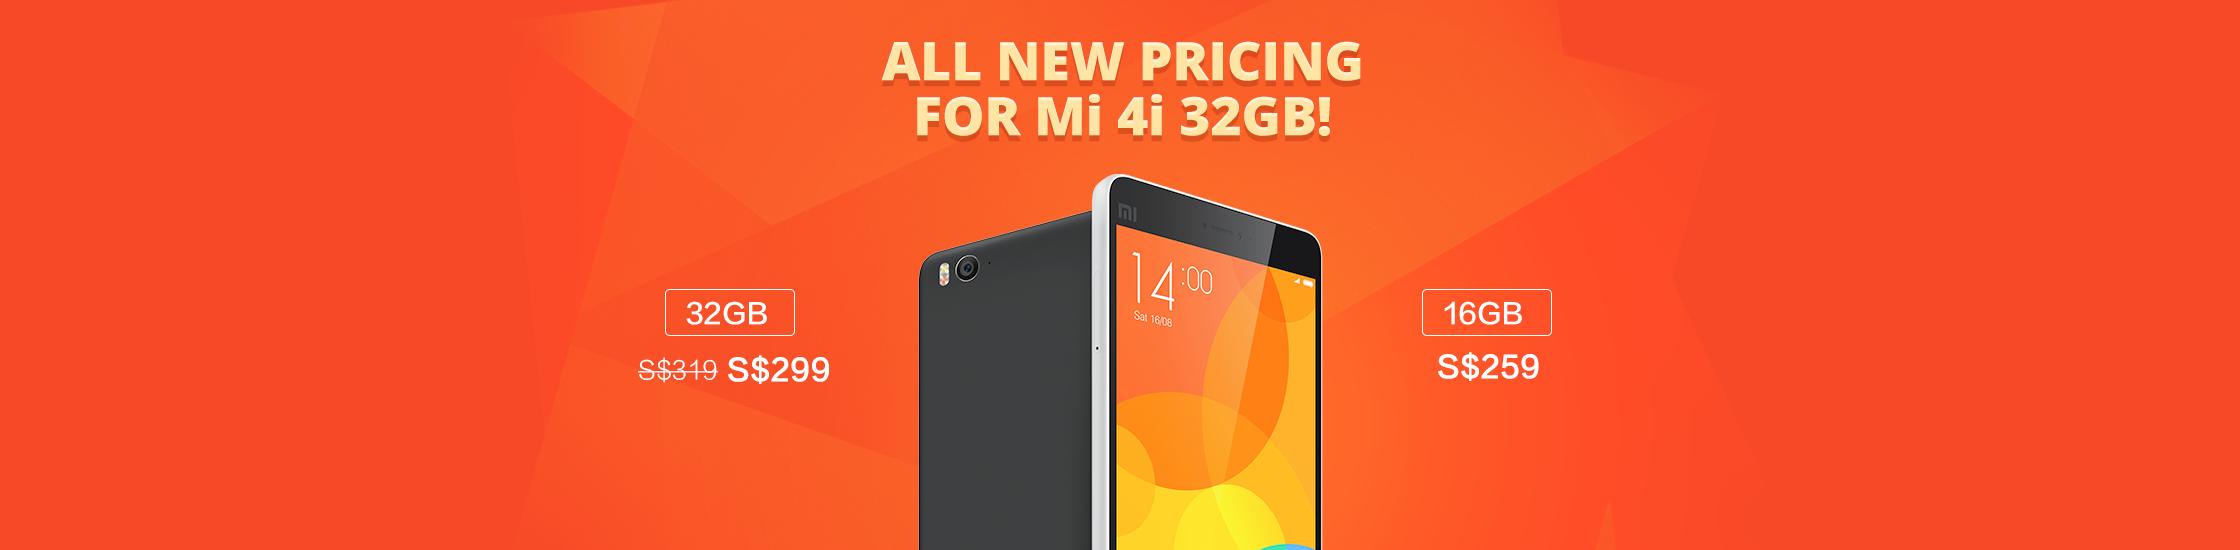 M4i price drop